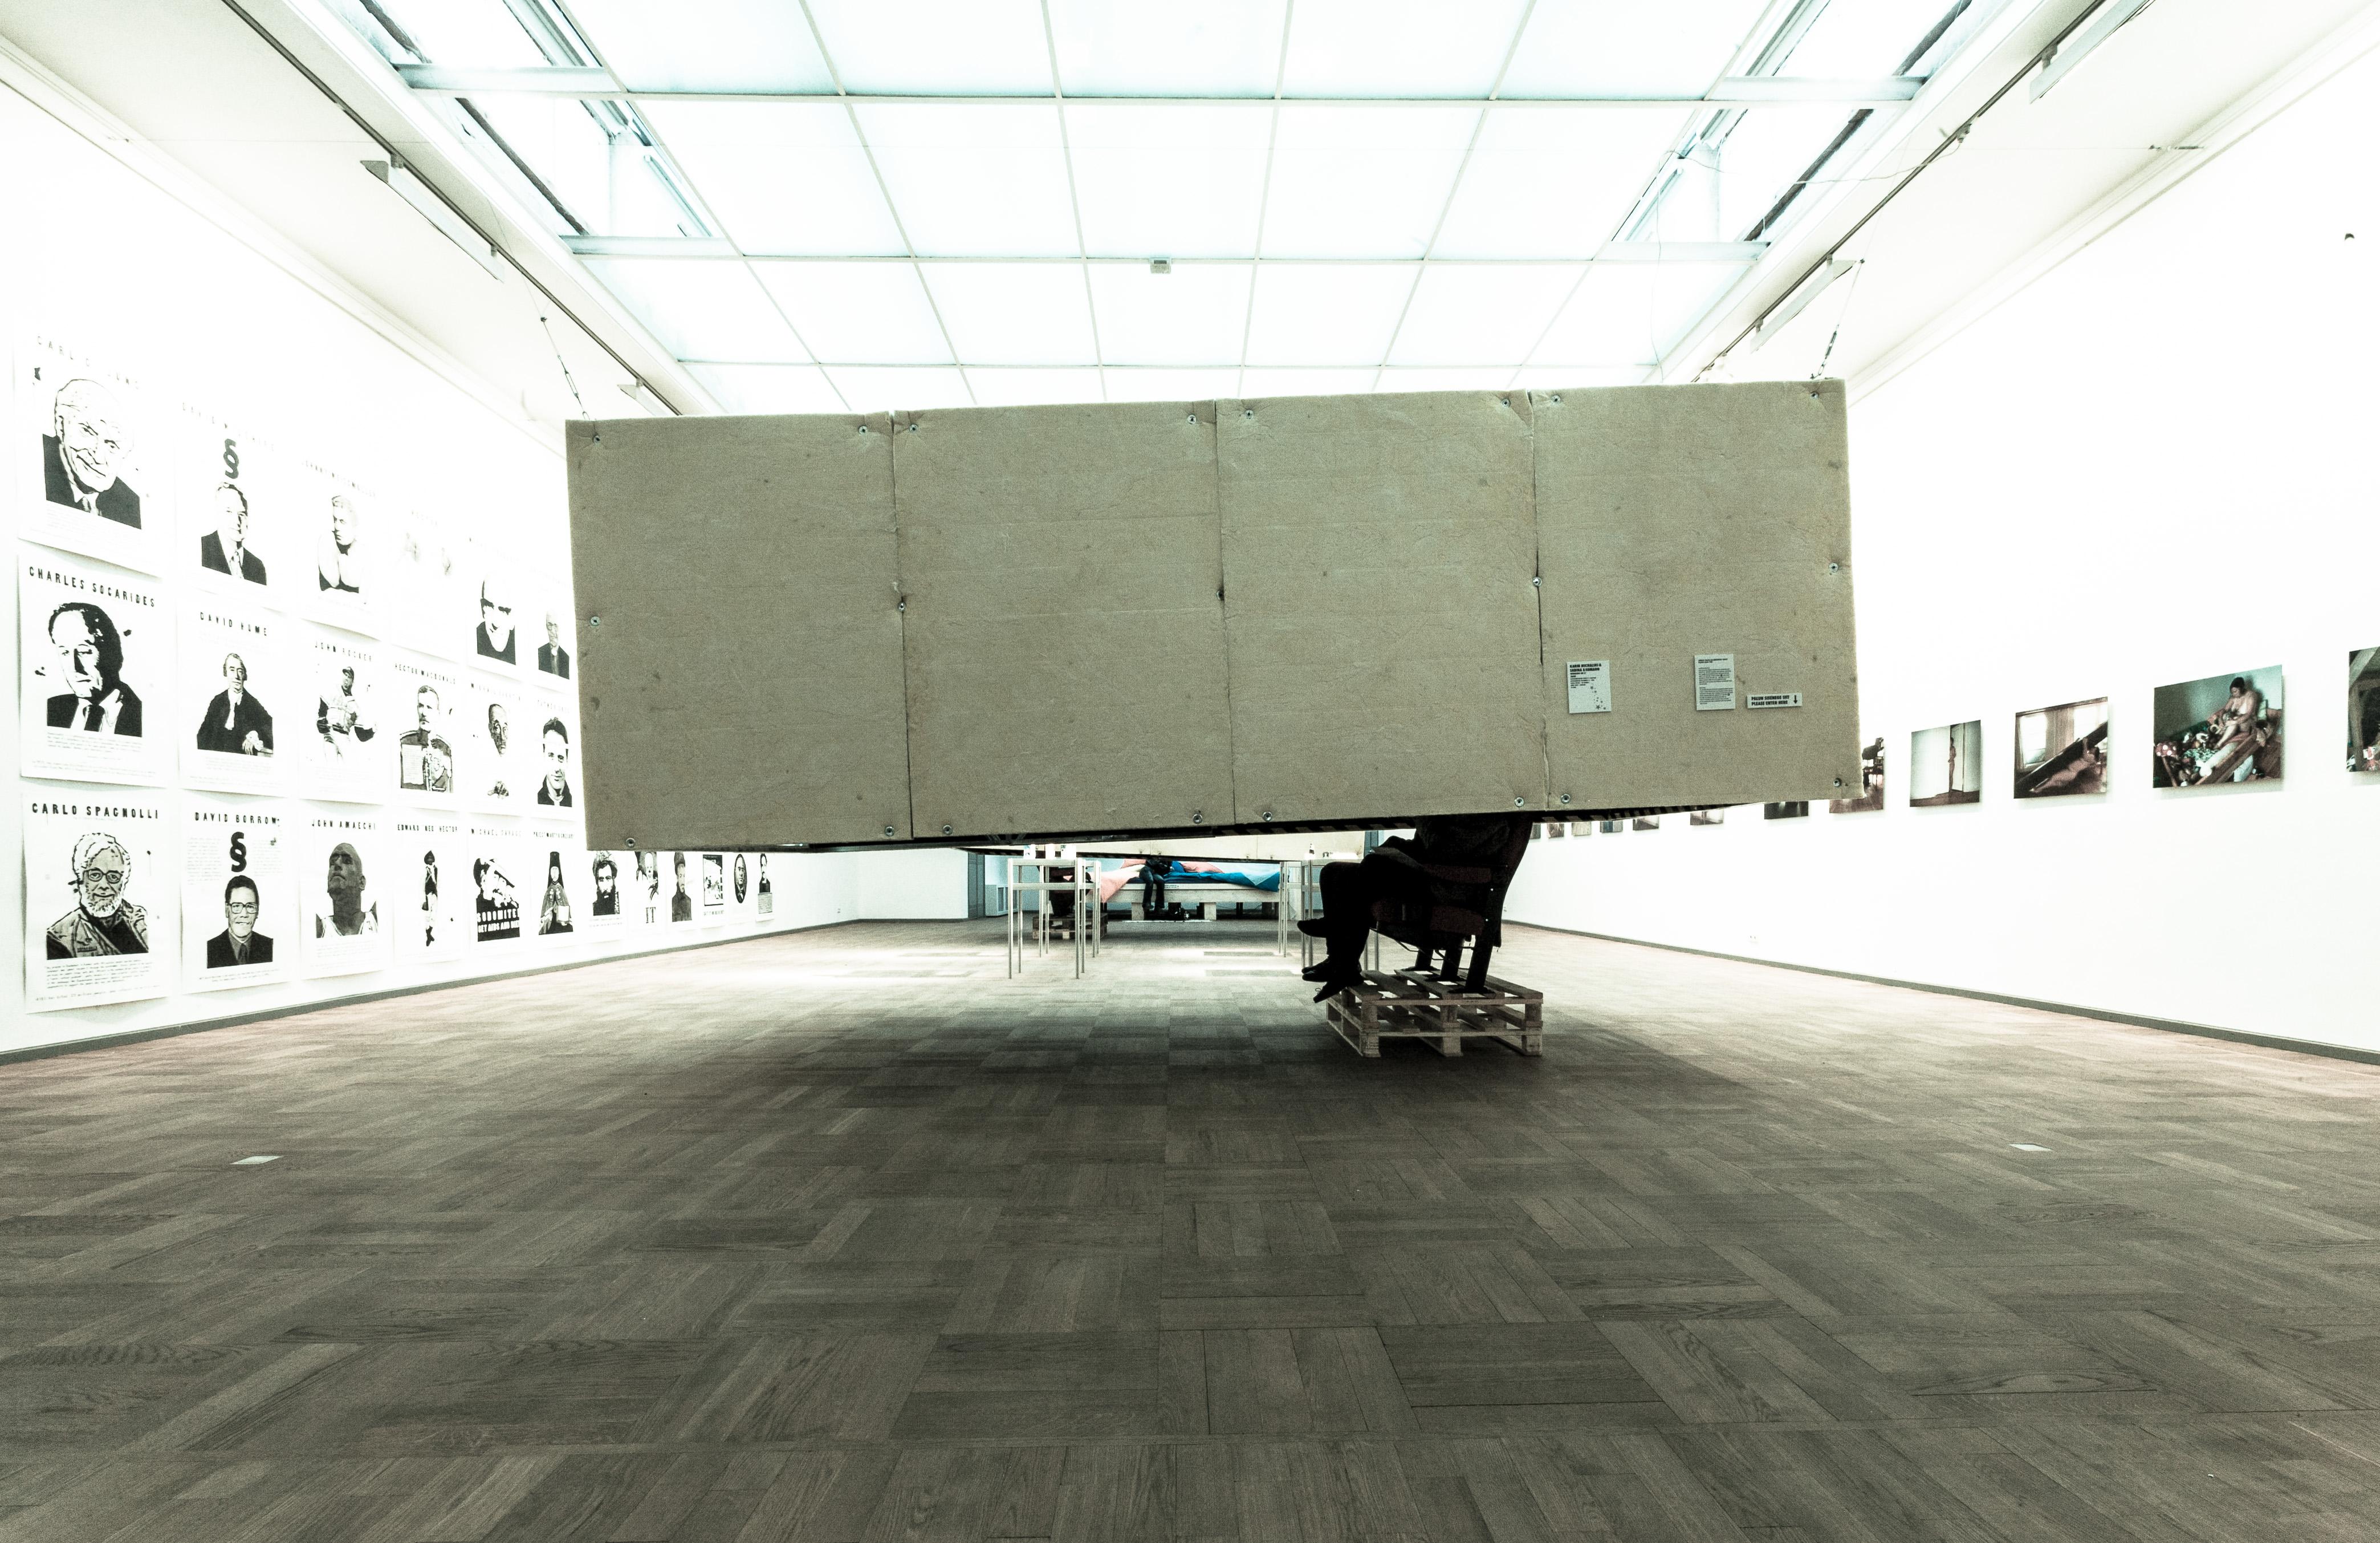 Untold Stories exhibition